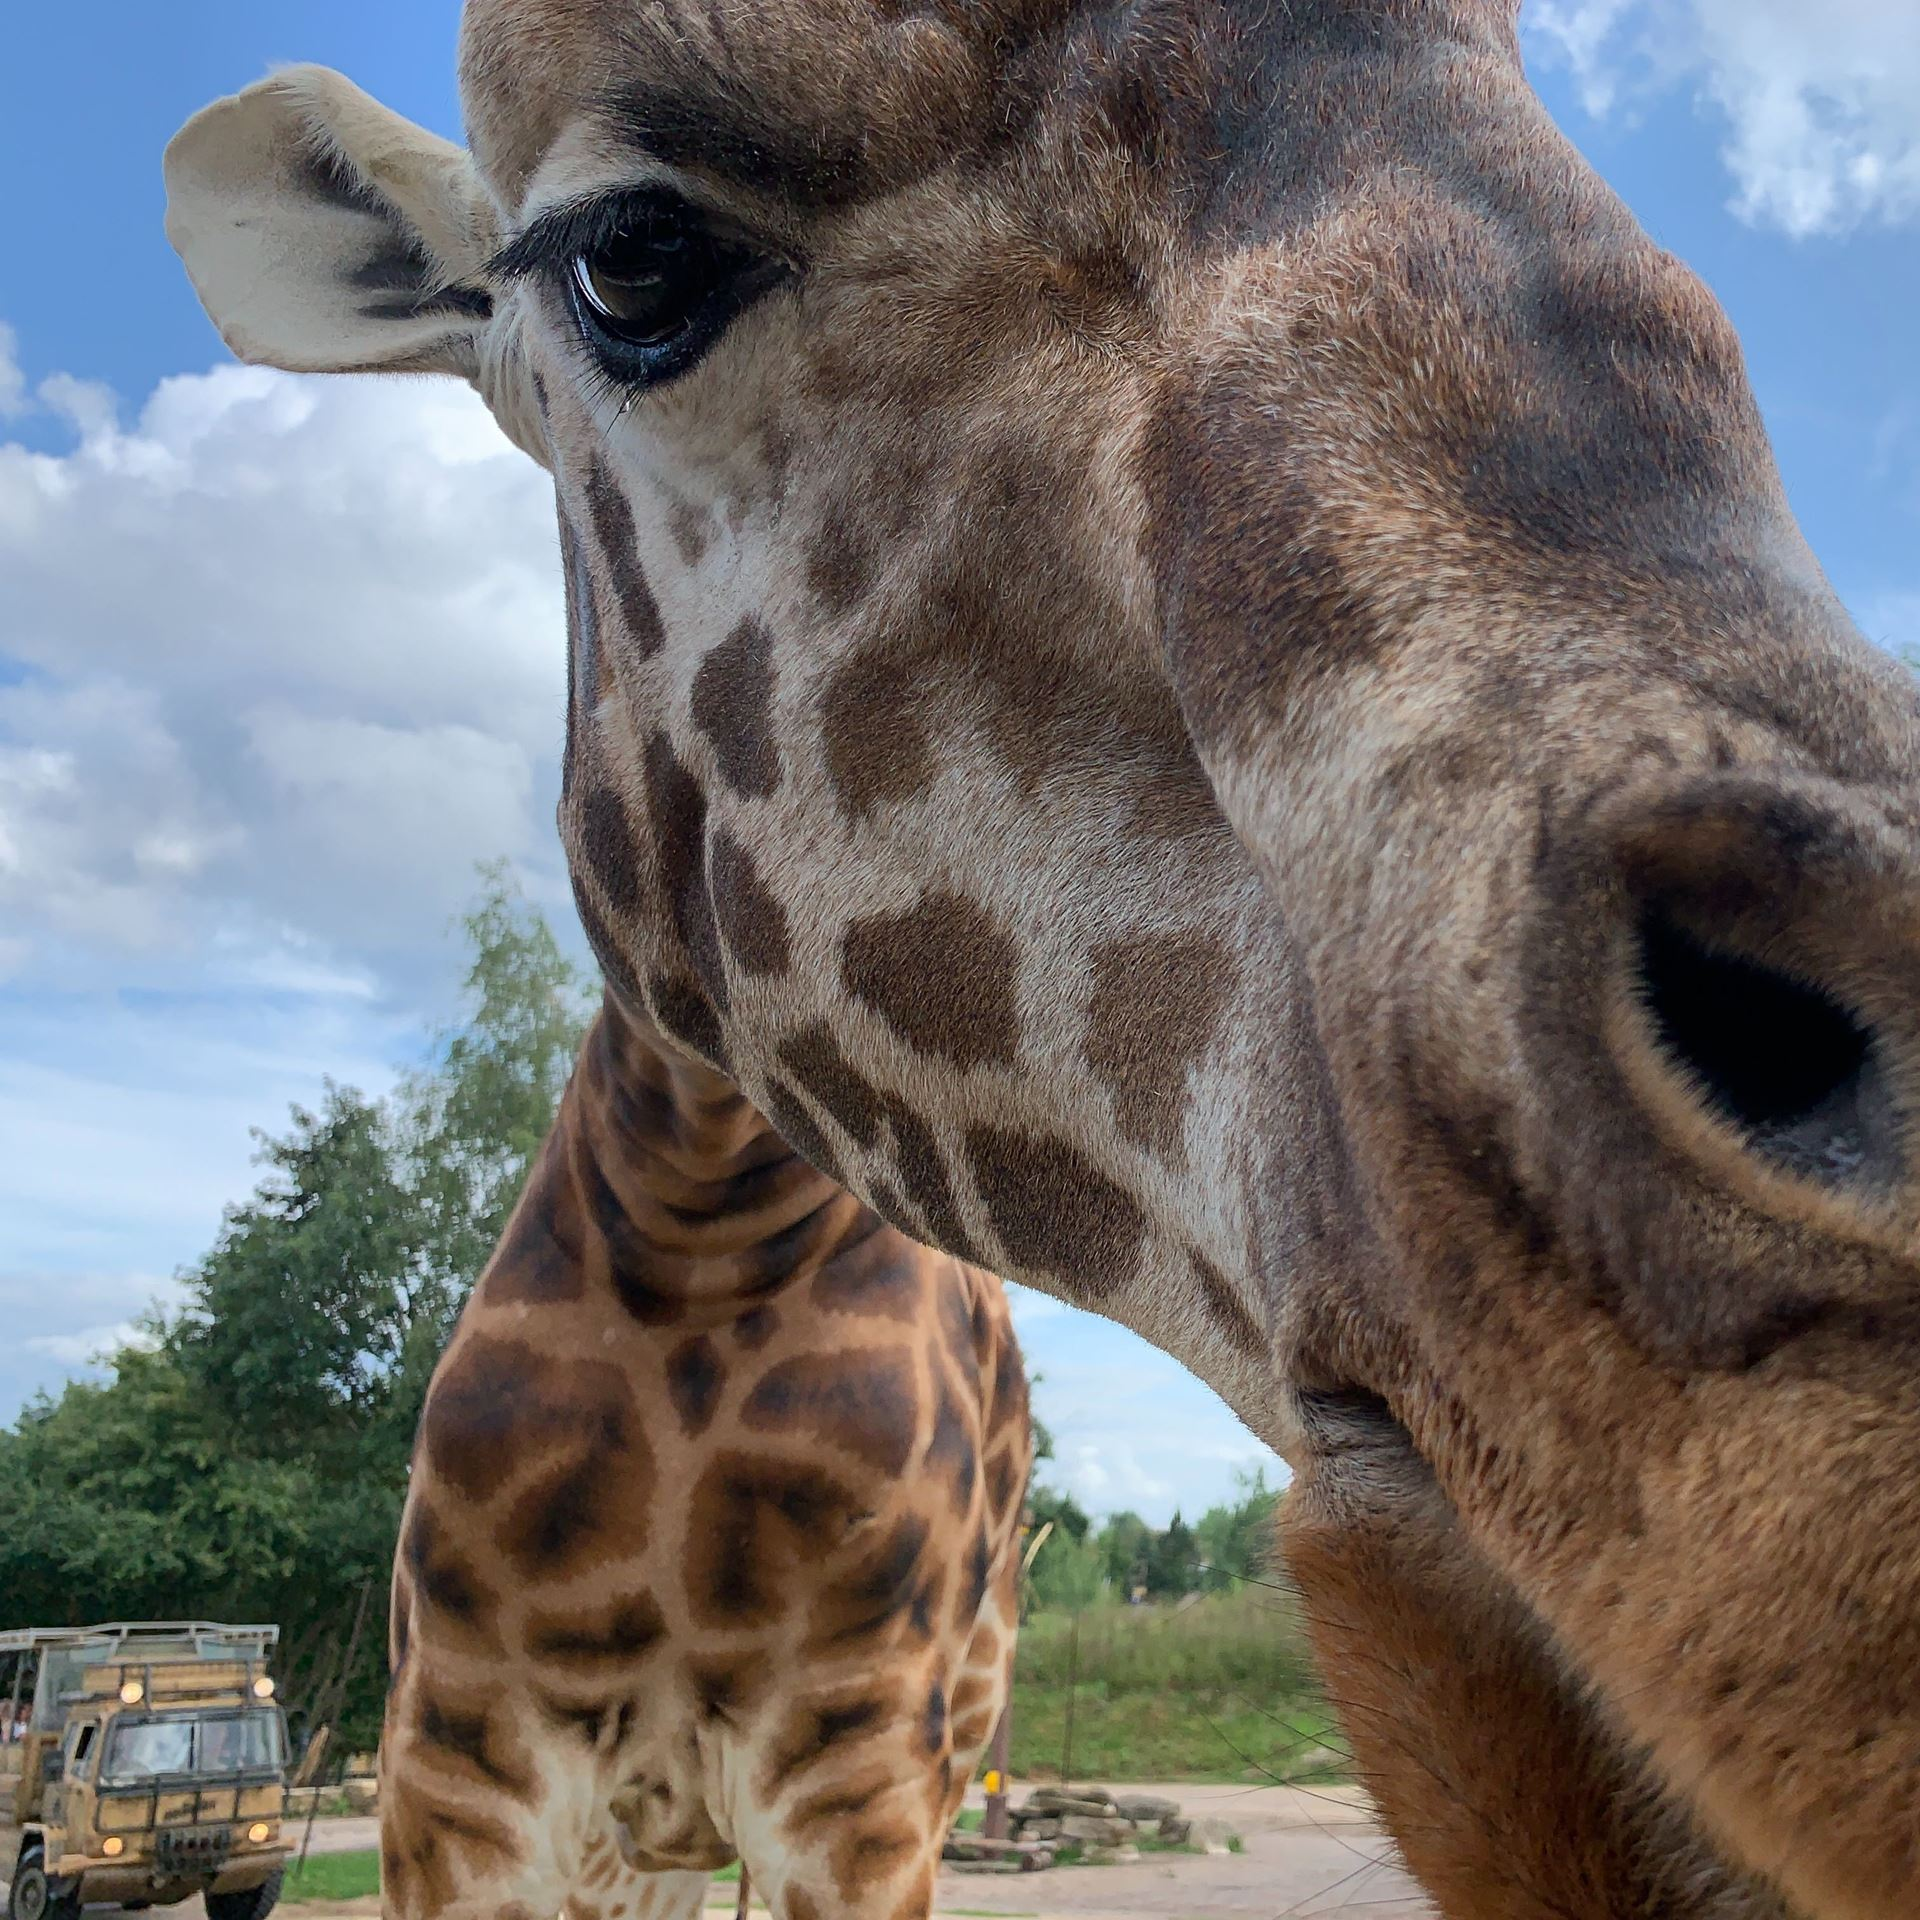 Feeding the Giraffes at Chessington